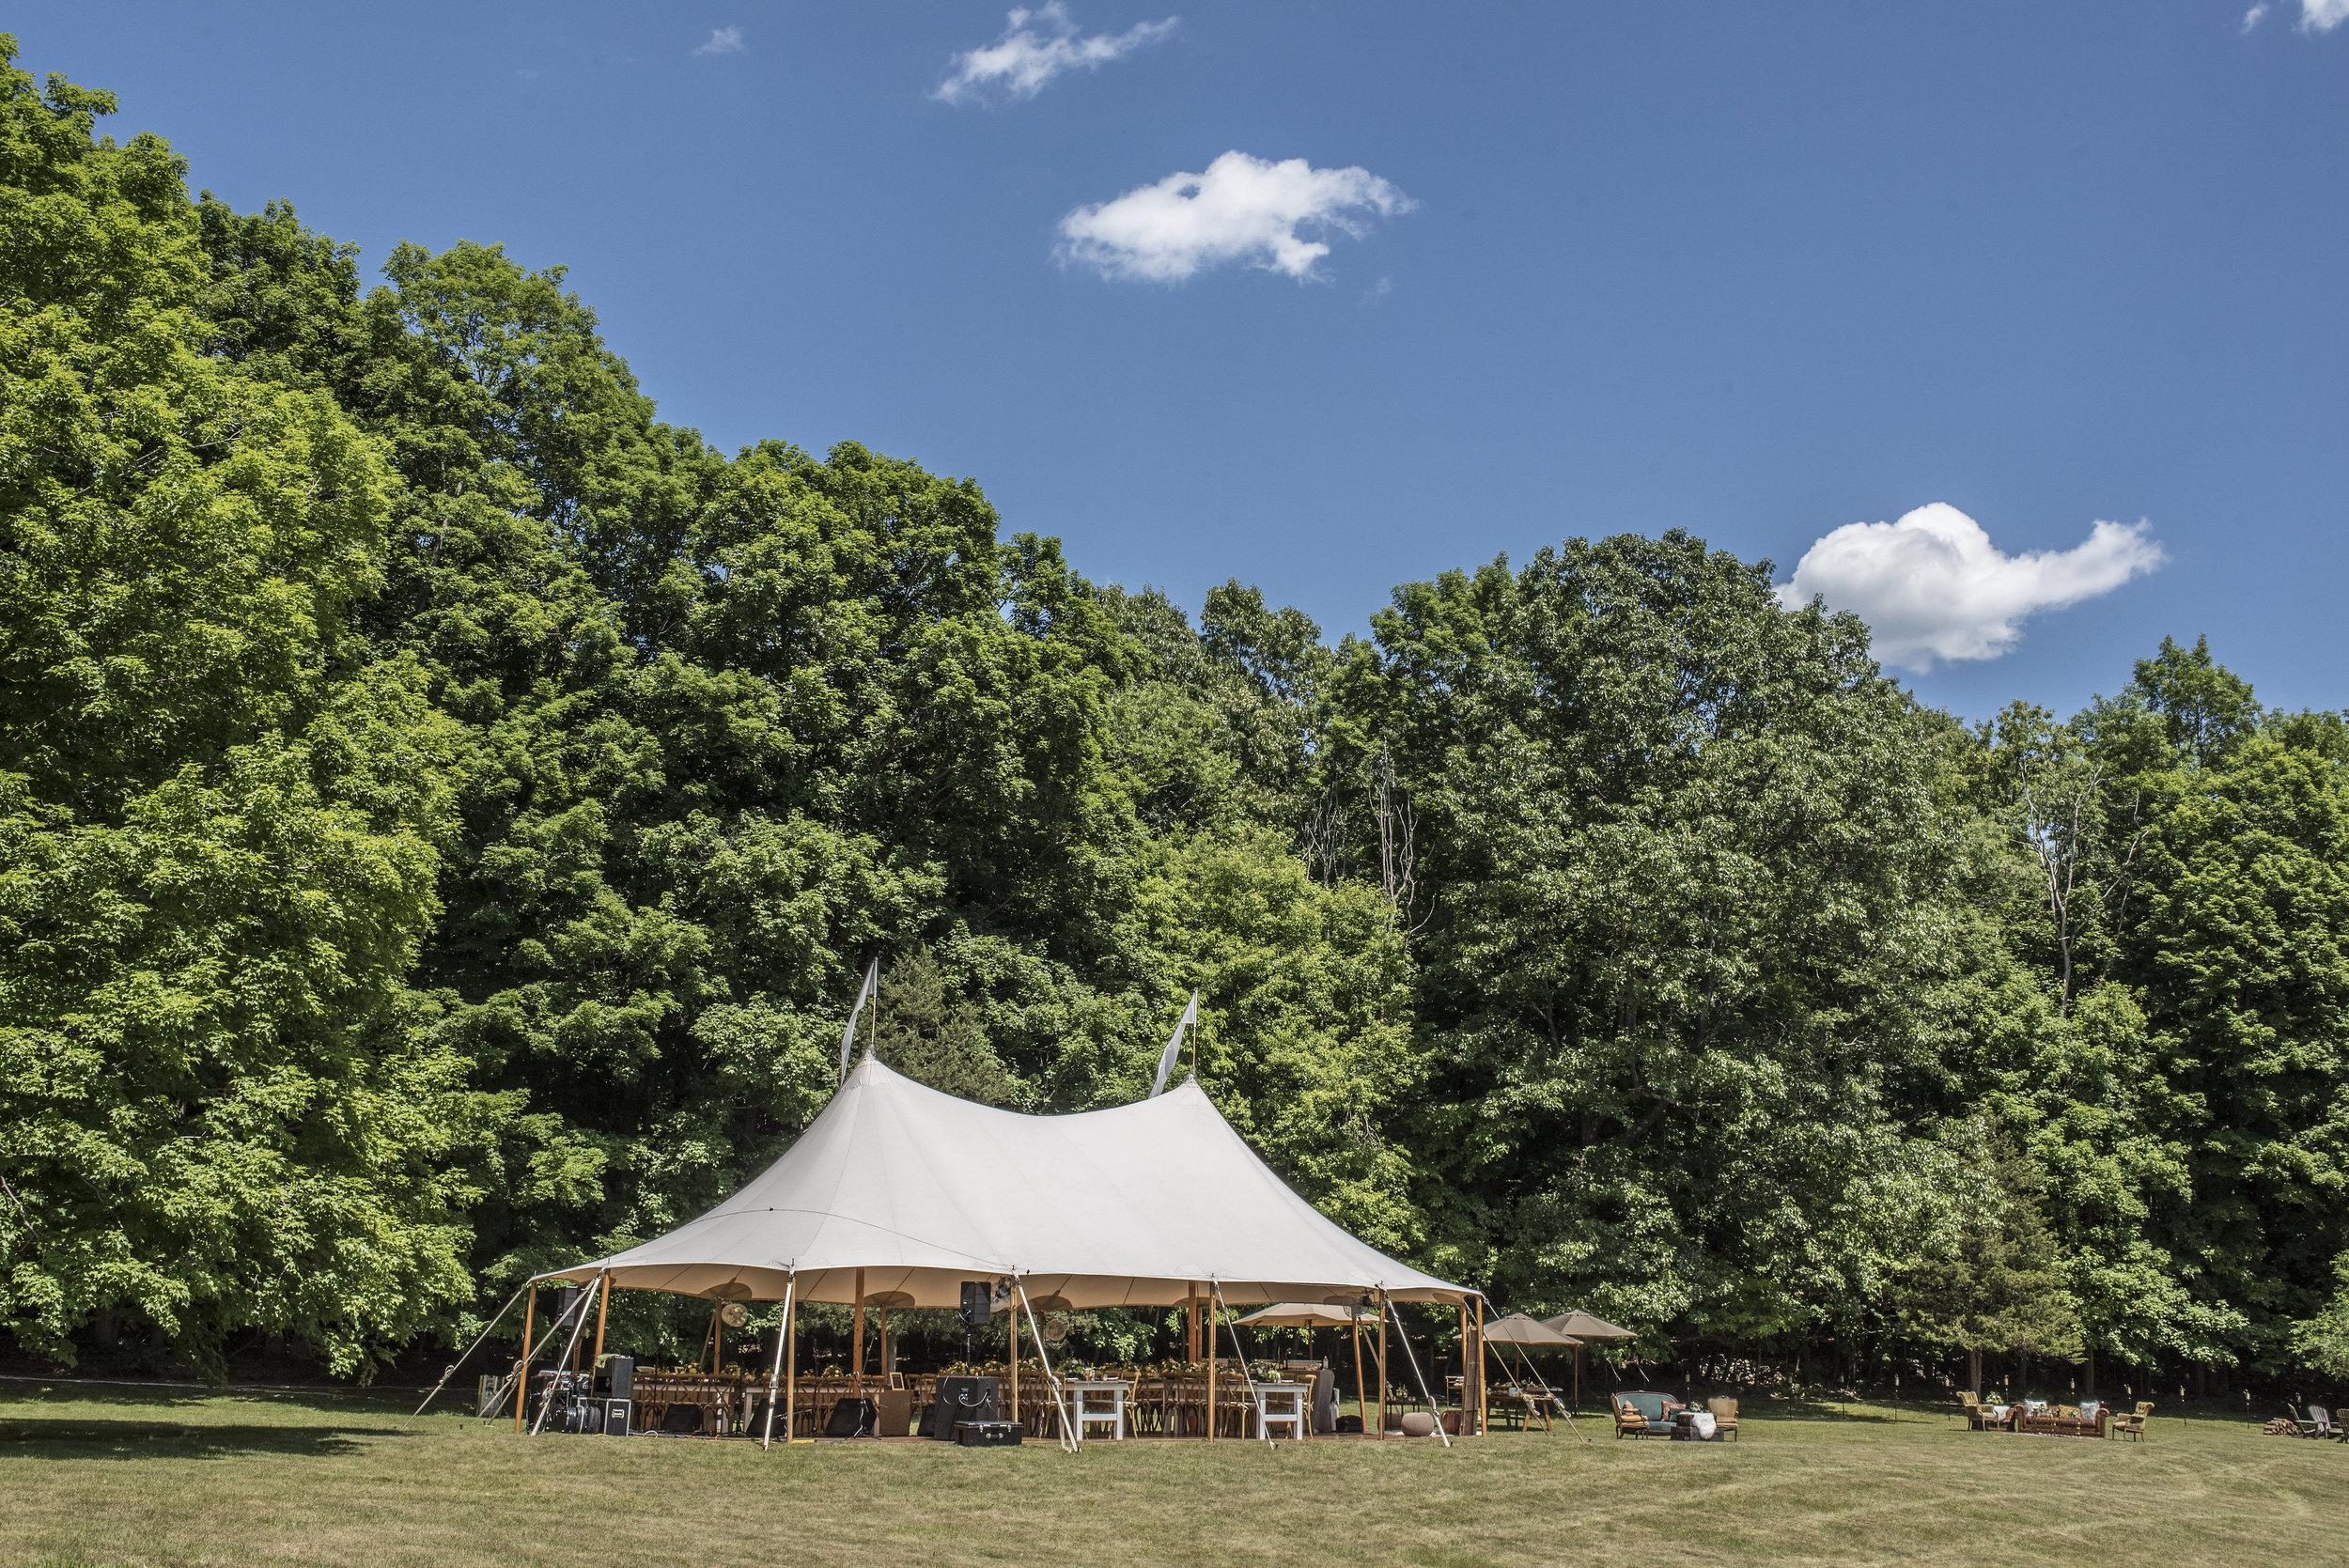 Andrea-Freeman-Events-Social-Event-Summer-Party-Rhinebeck-NY-13.JPG